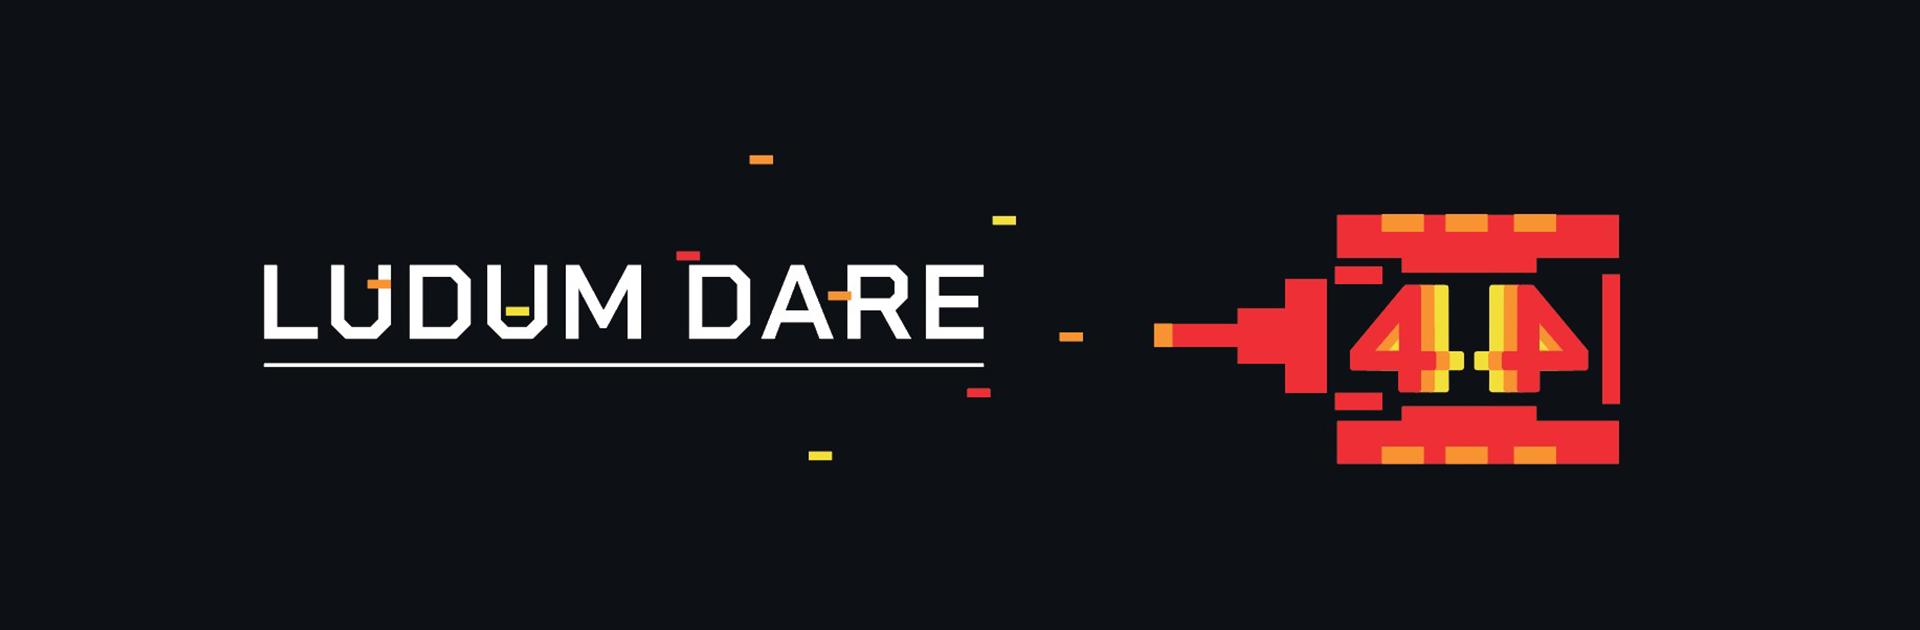 Behaviour hosts a Live Edition of the Ludum Dare 44 Game Jam